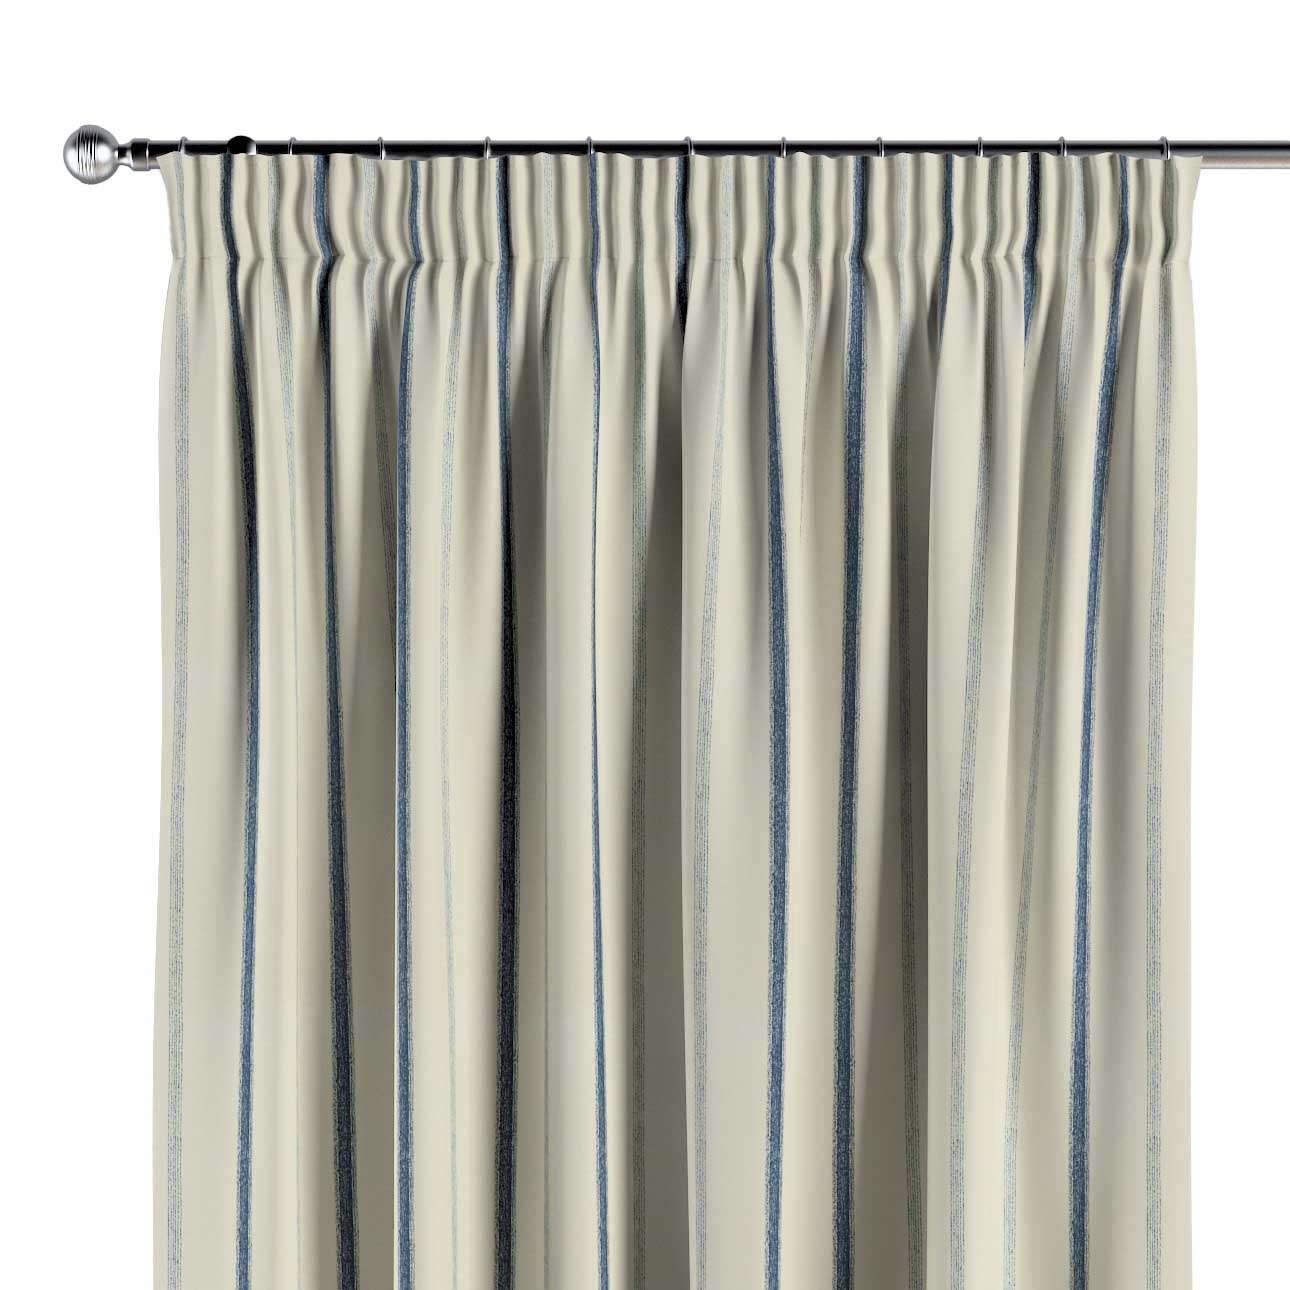 Pencil pleat curtain in collection Avinon, fabric: 129-66